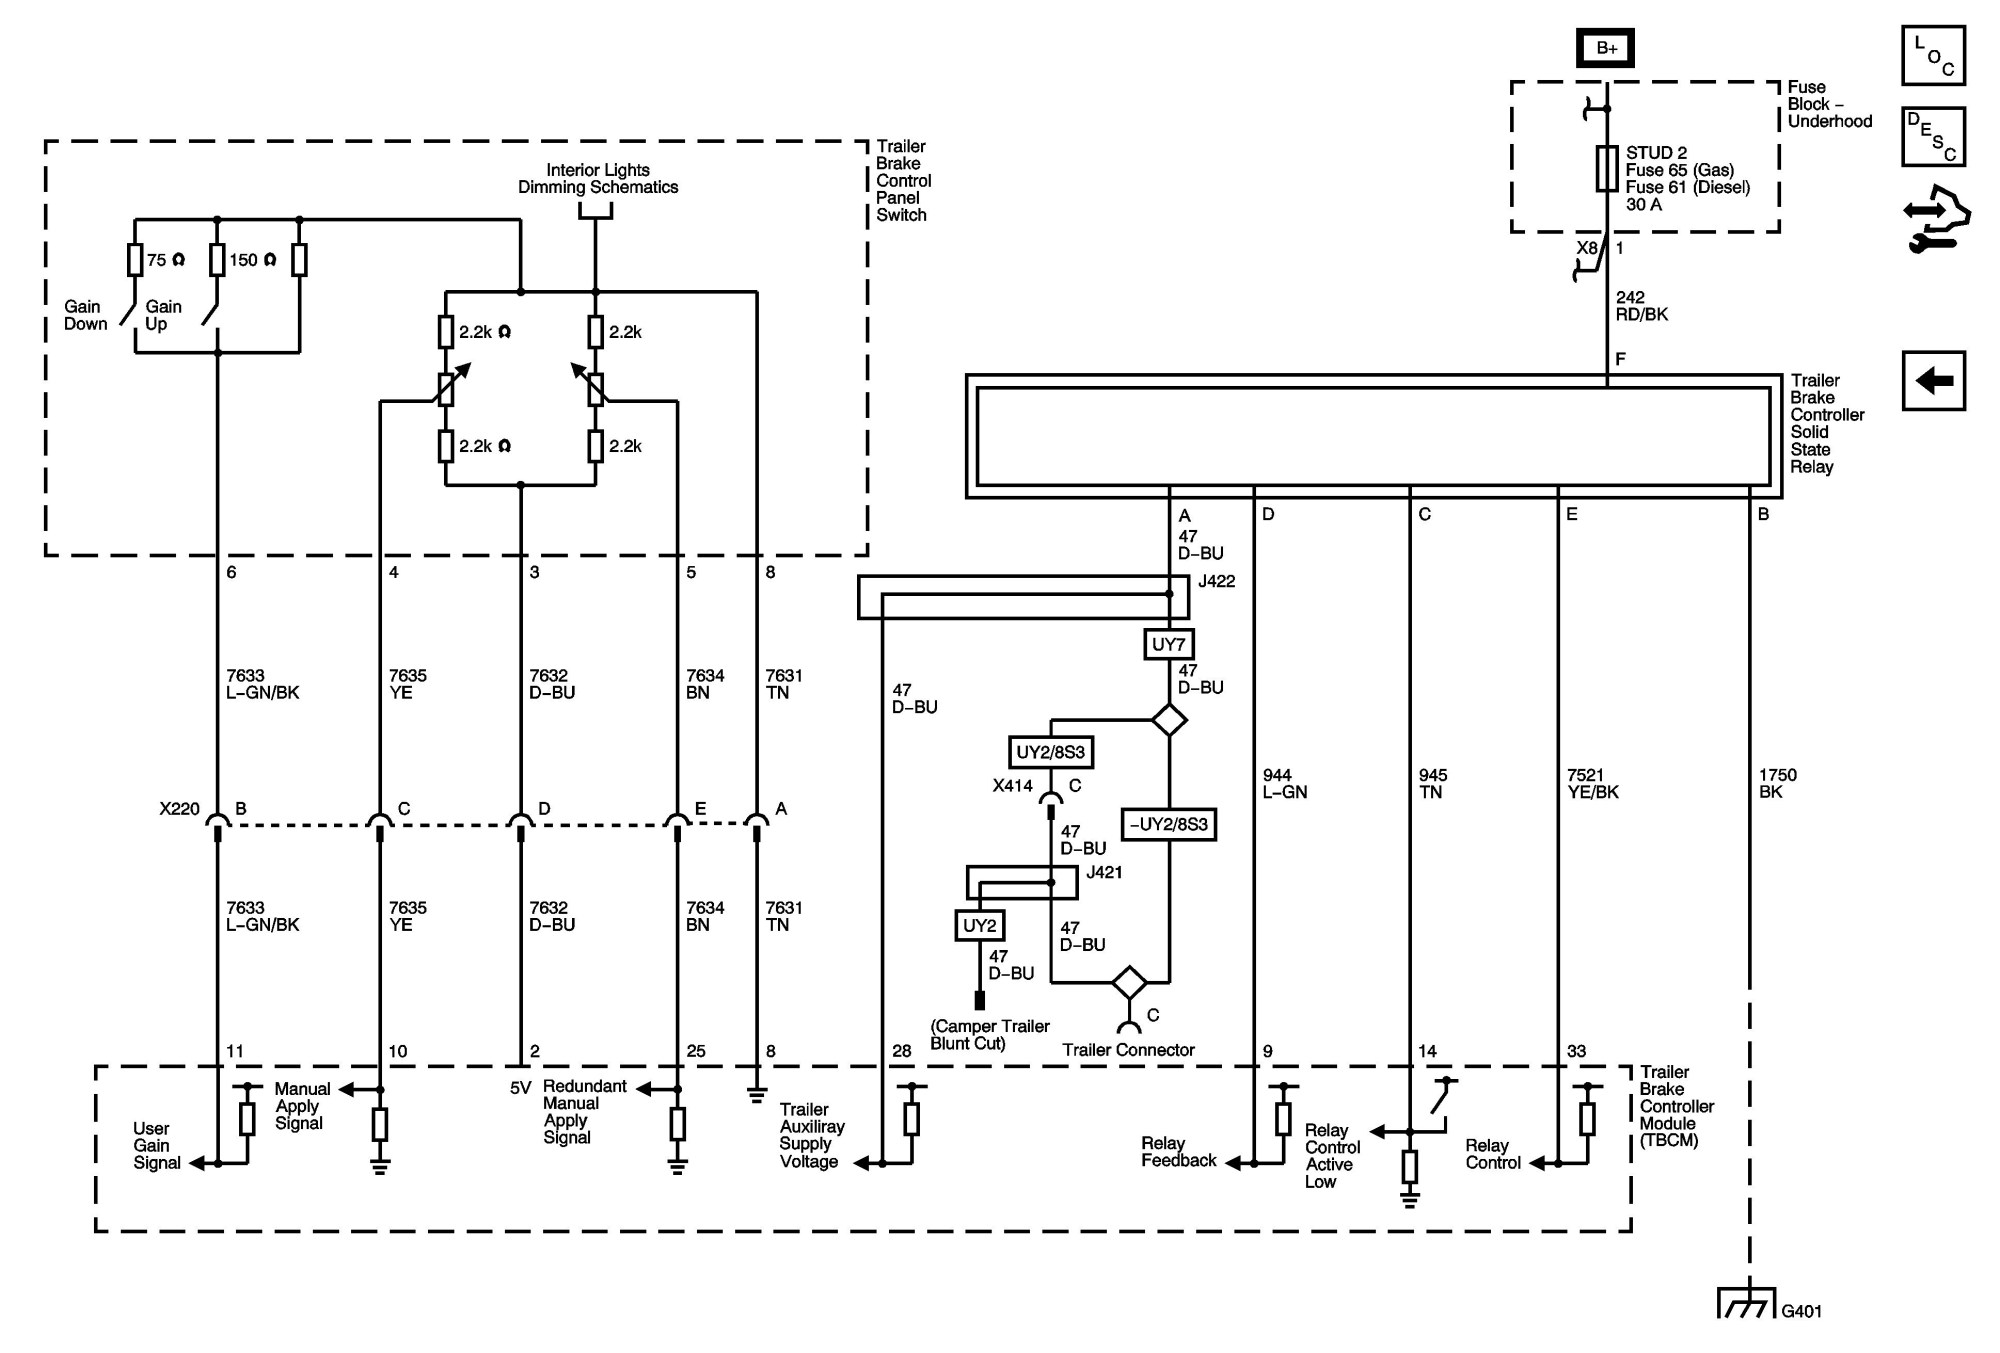 hight resolution of 2005 chevy wiring diagrams diagram data schema exp2005 silverado trailer wiring schematic diagram data schema exp